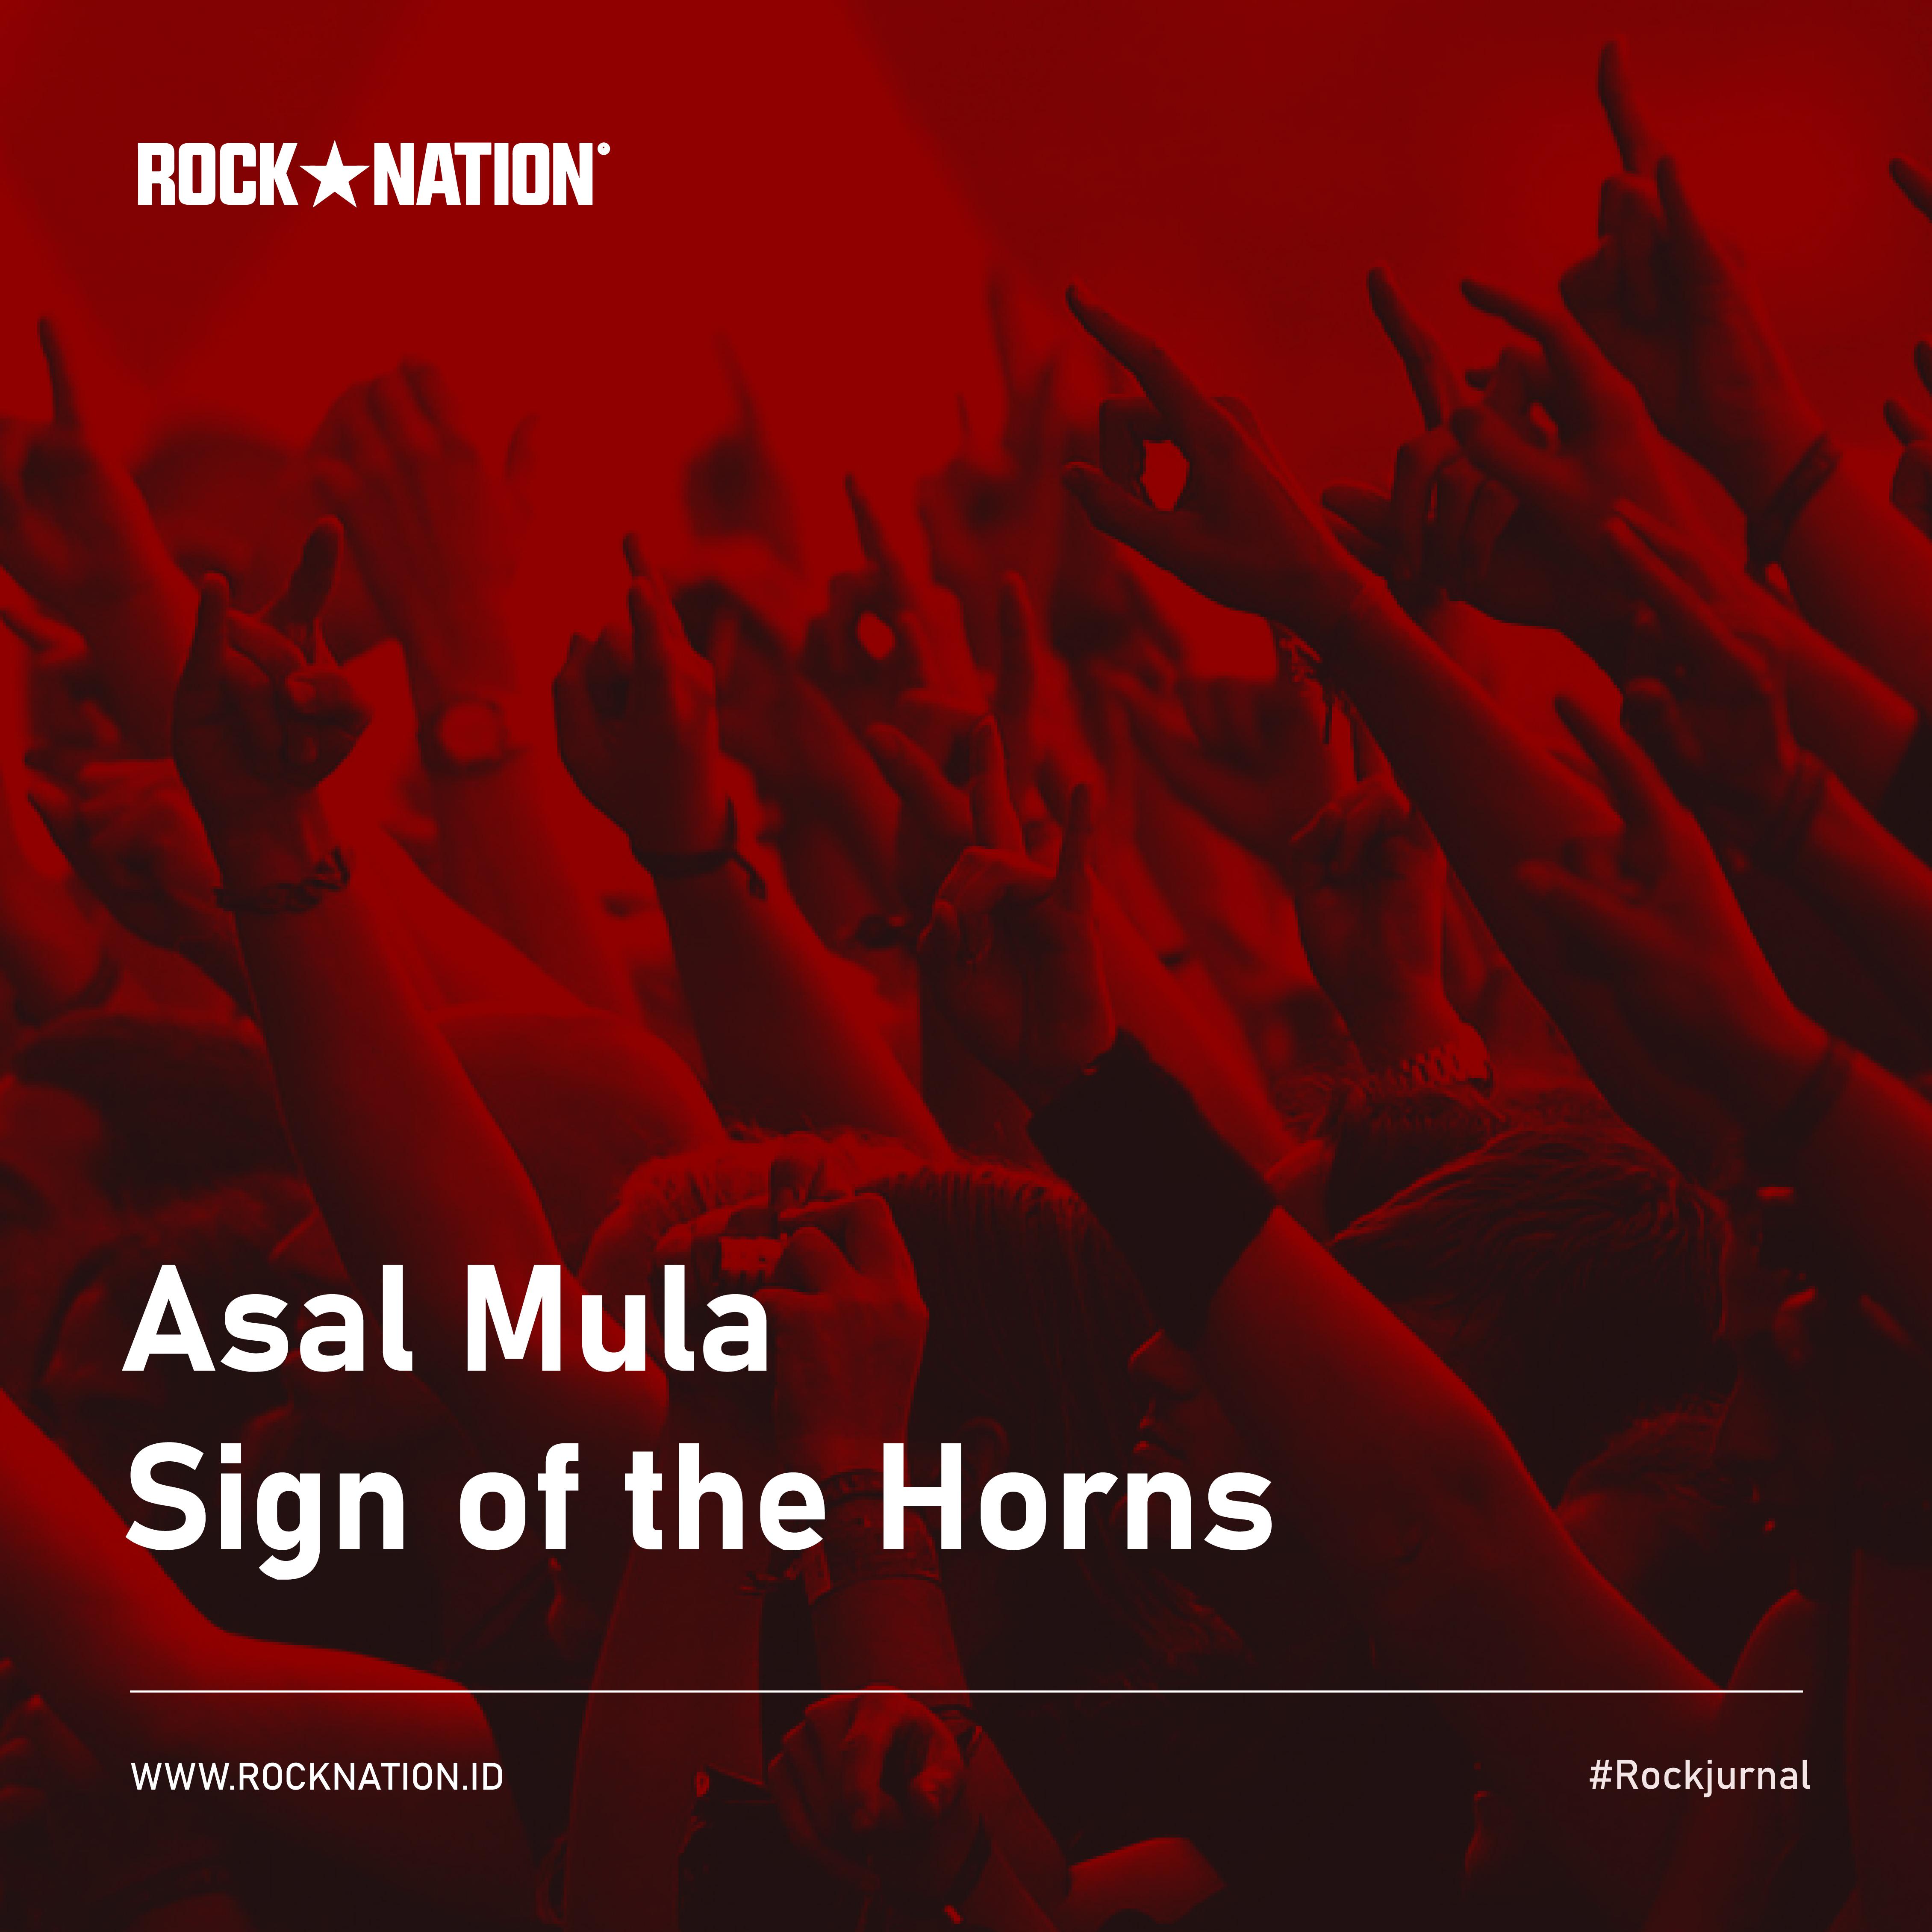 Asal Mula Sign of the Horns image